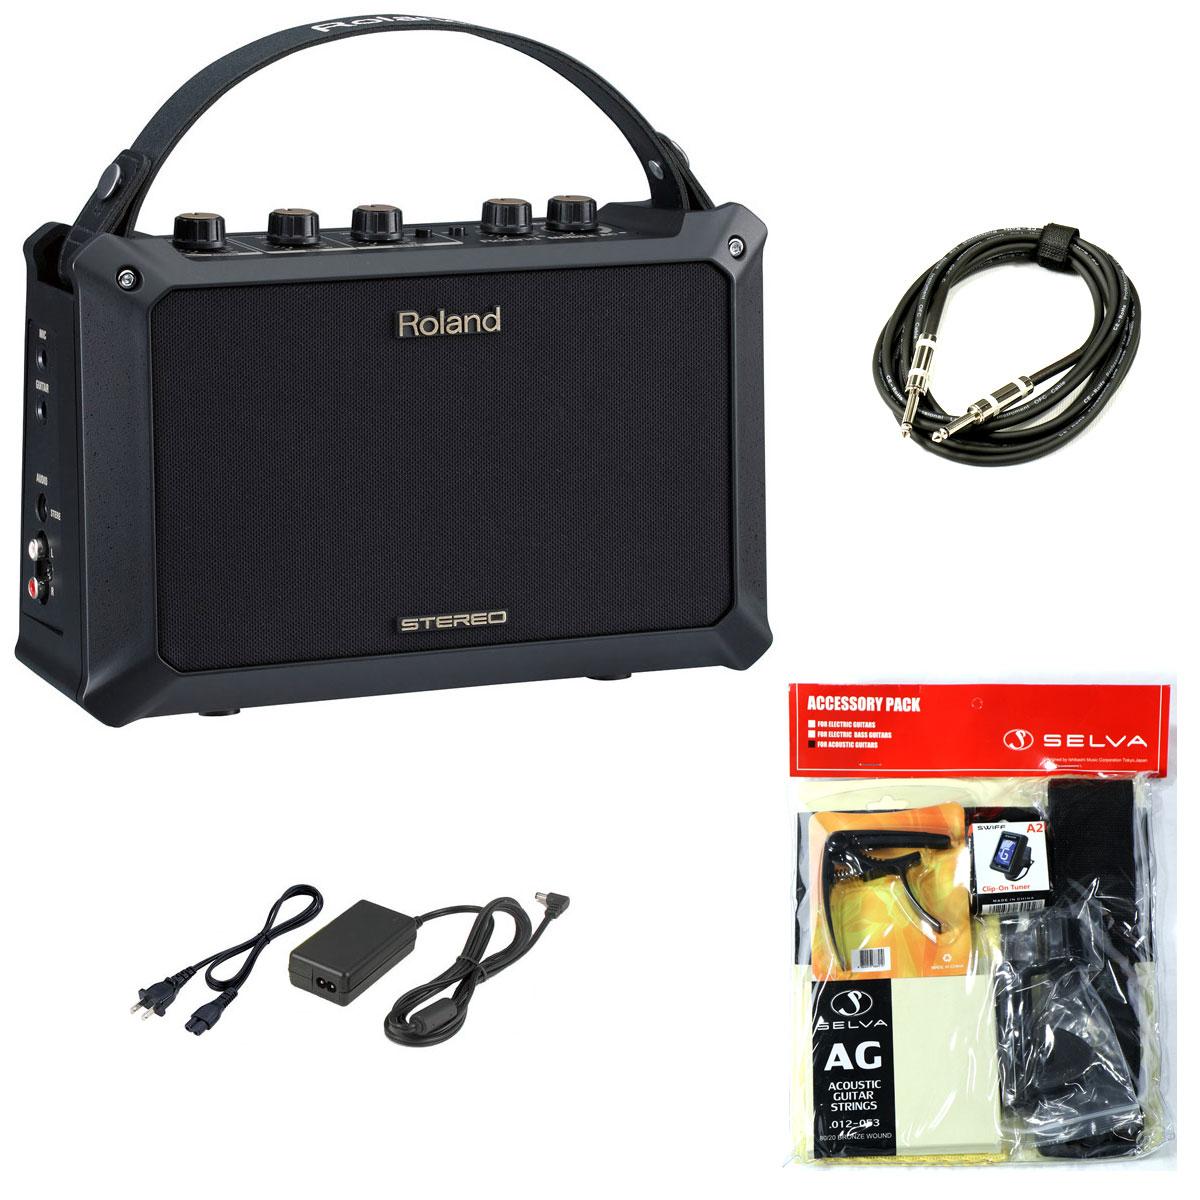 Roland / Mobile AC Acoustic Guitar Amplifier 【アコースティック用アンプスターターセット】【電池駆動可能】 【YRK】